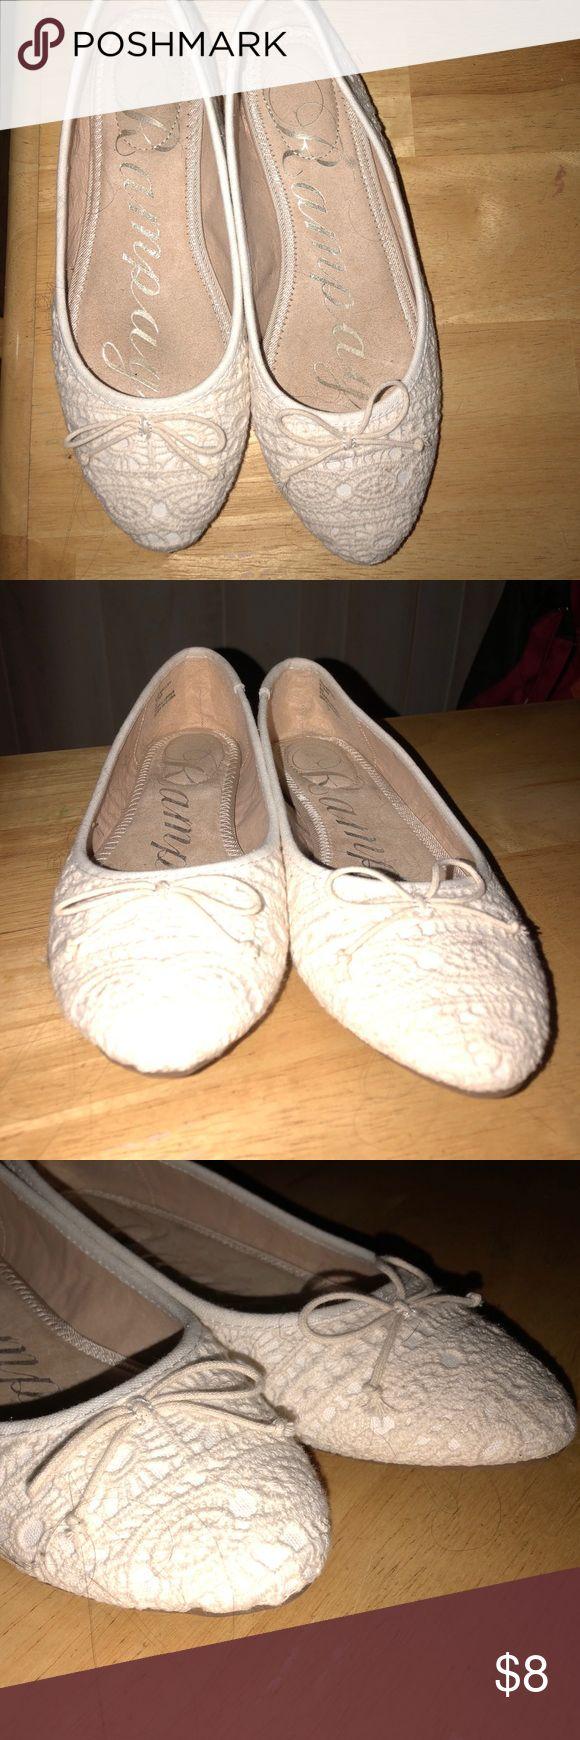 Rampage off white (cream) ballet flat 8M Rampage off white (cream) ballet flat with crochet lace overlay. 8M worn once Rampage Shoes